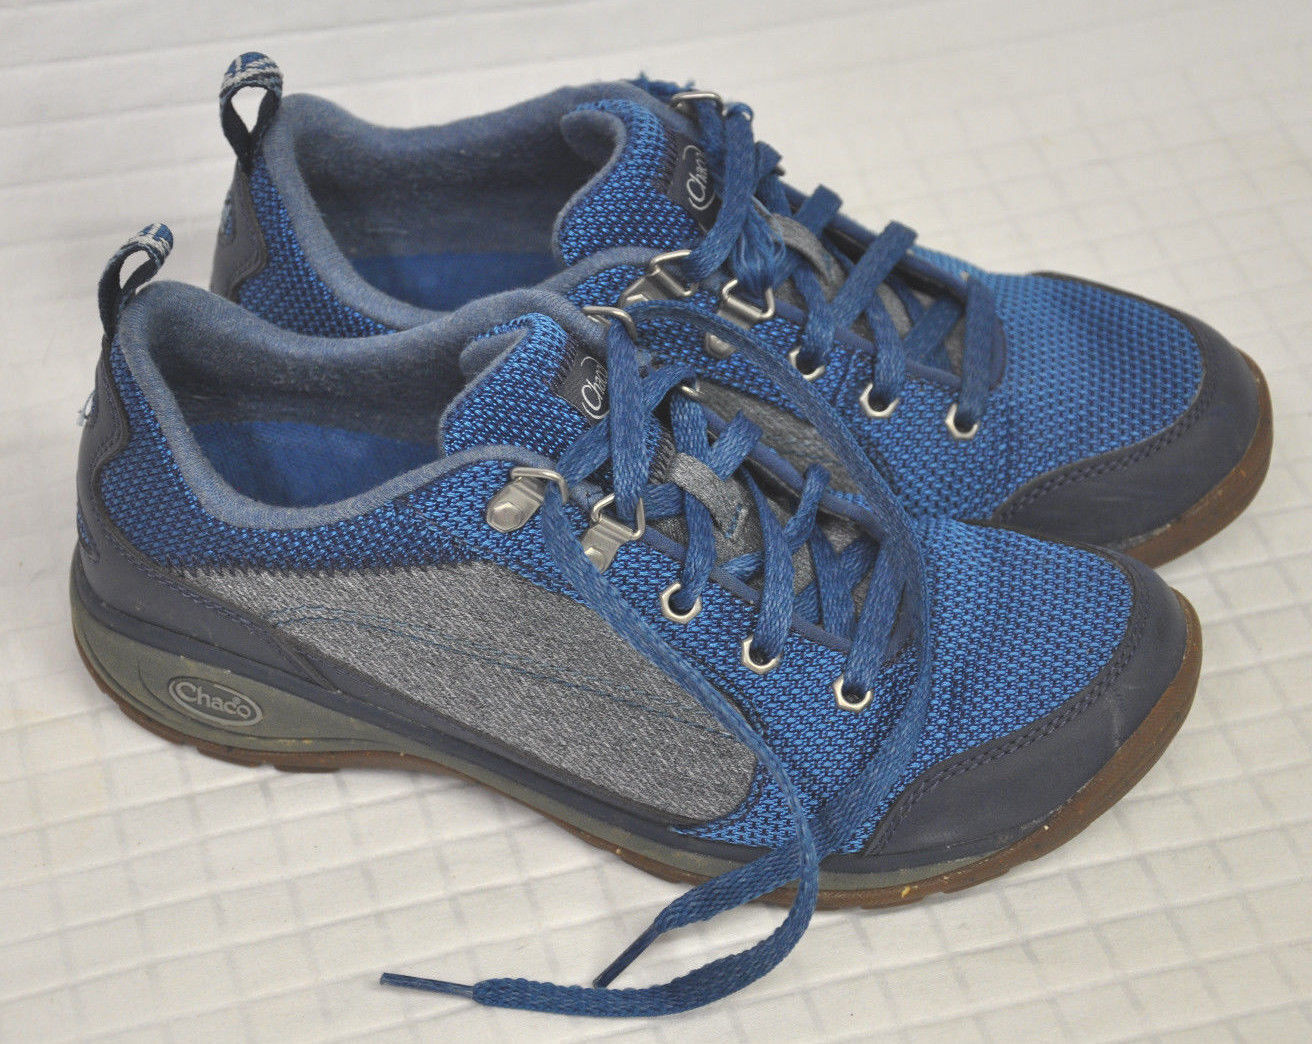 CHACO Kanarra INDIGO bluee CredVER shoes SNEAKER Women's Sz 7.5 STREET Hiking